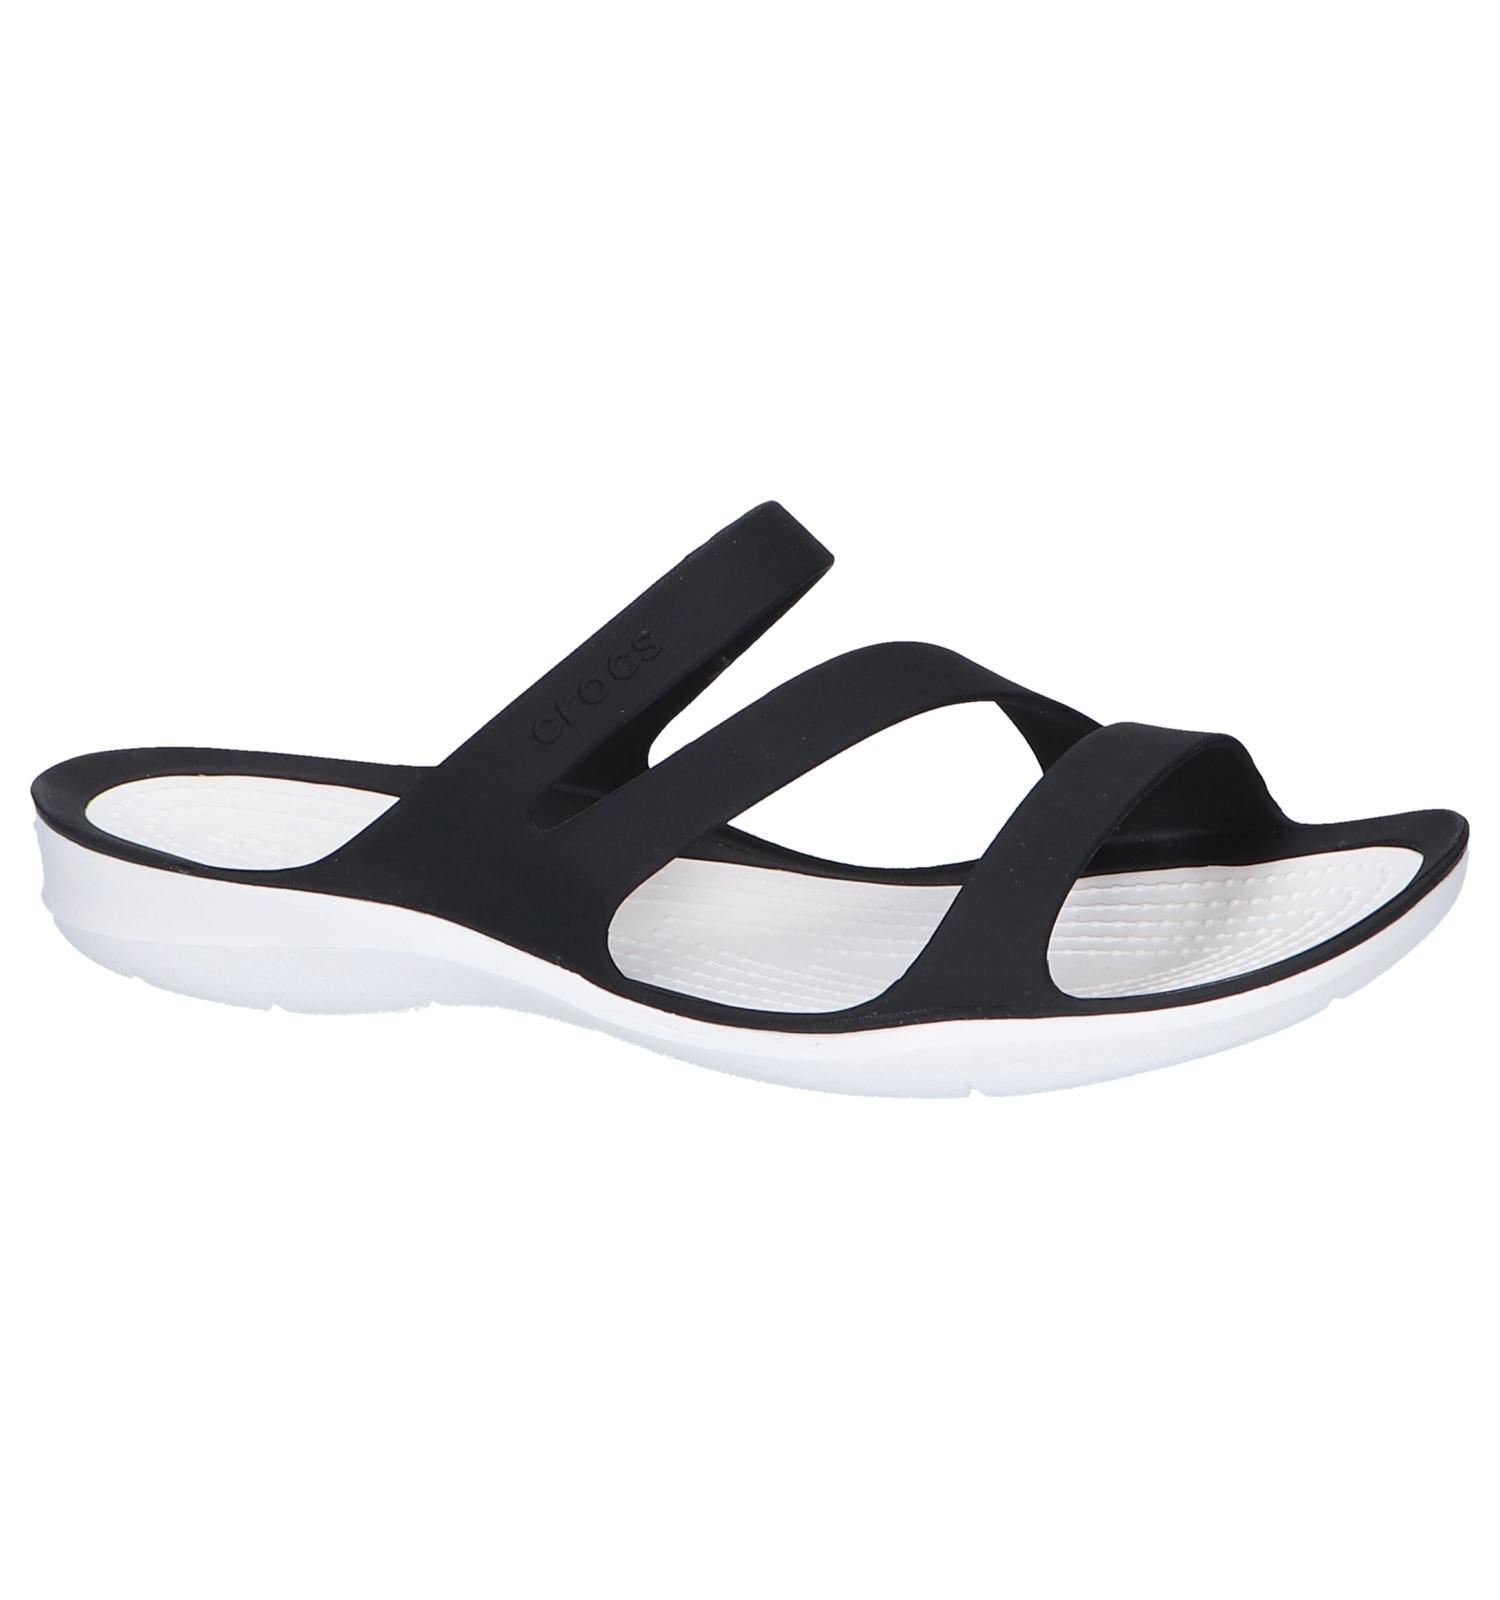 Swiftwater Sandal slippers dames teal light | Crocs